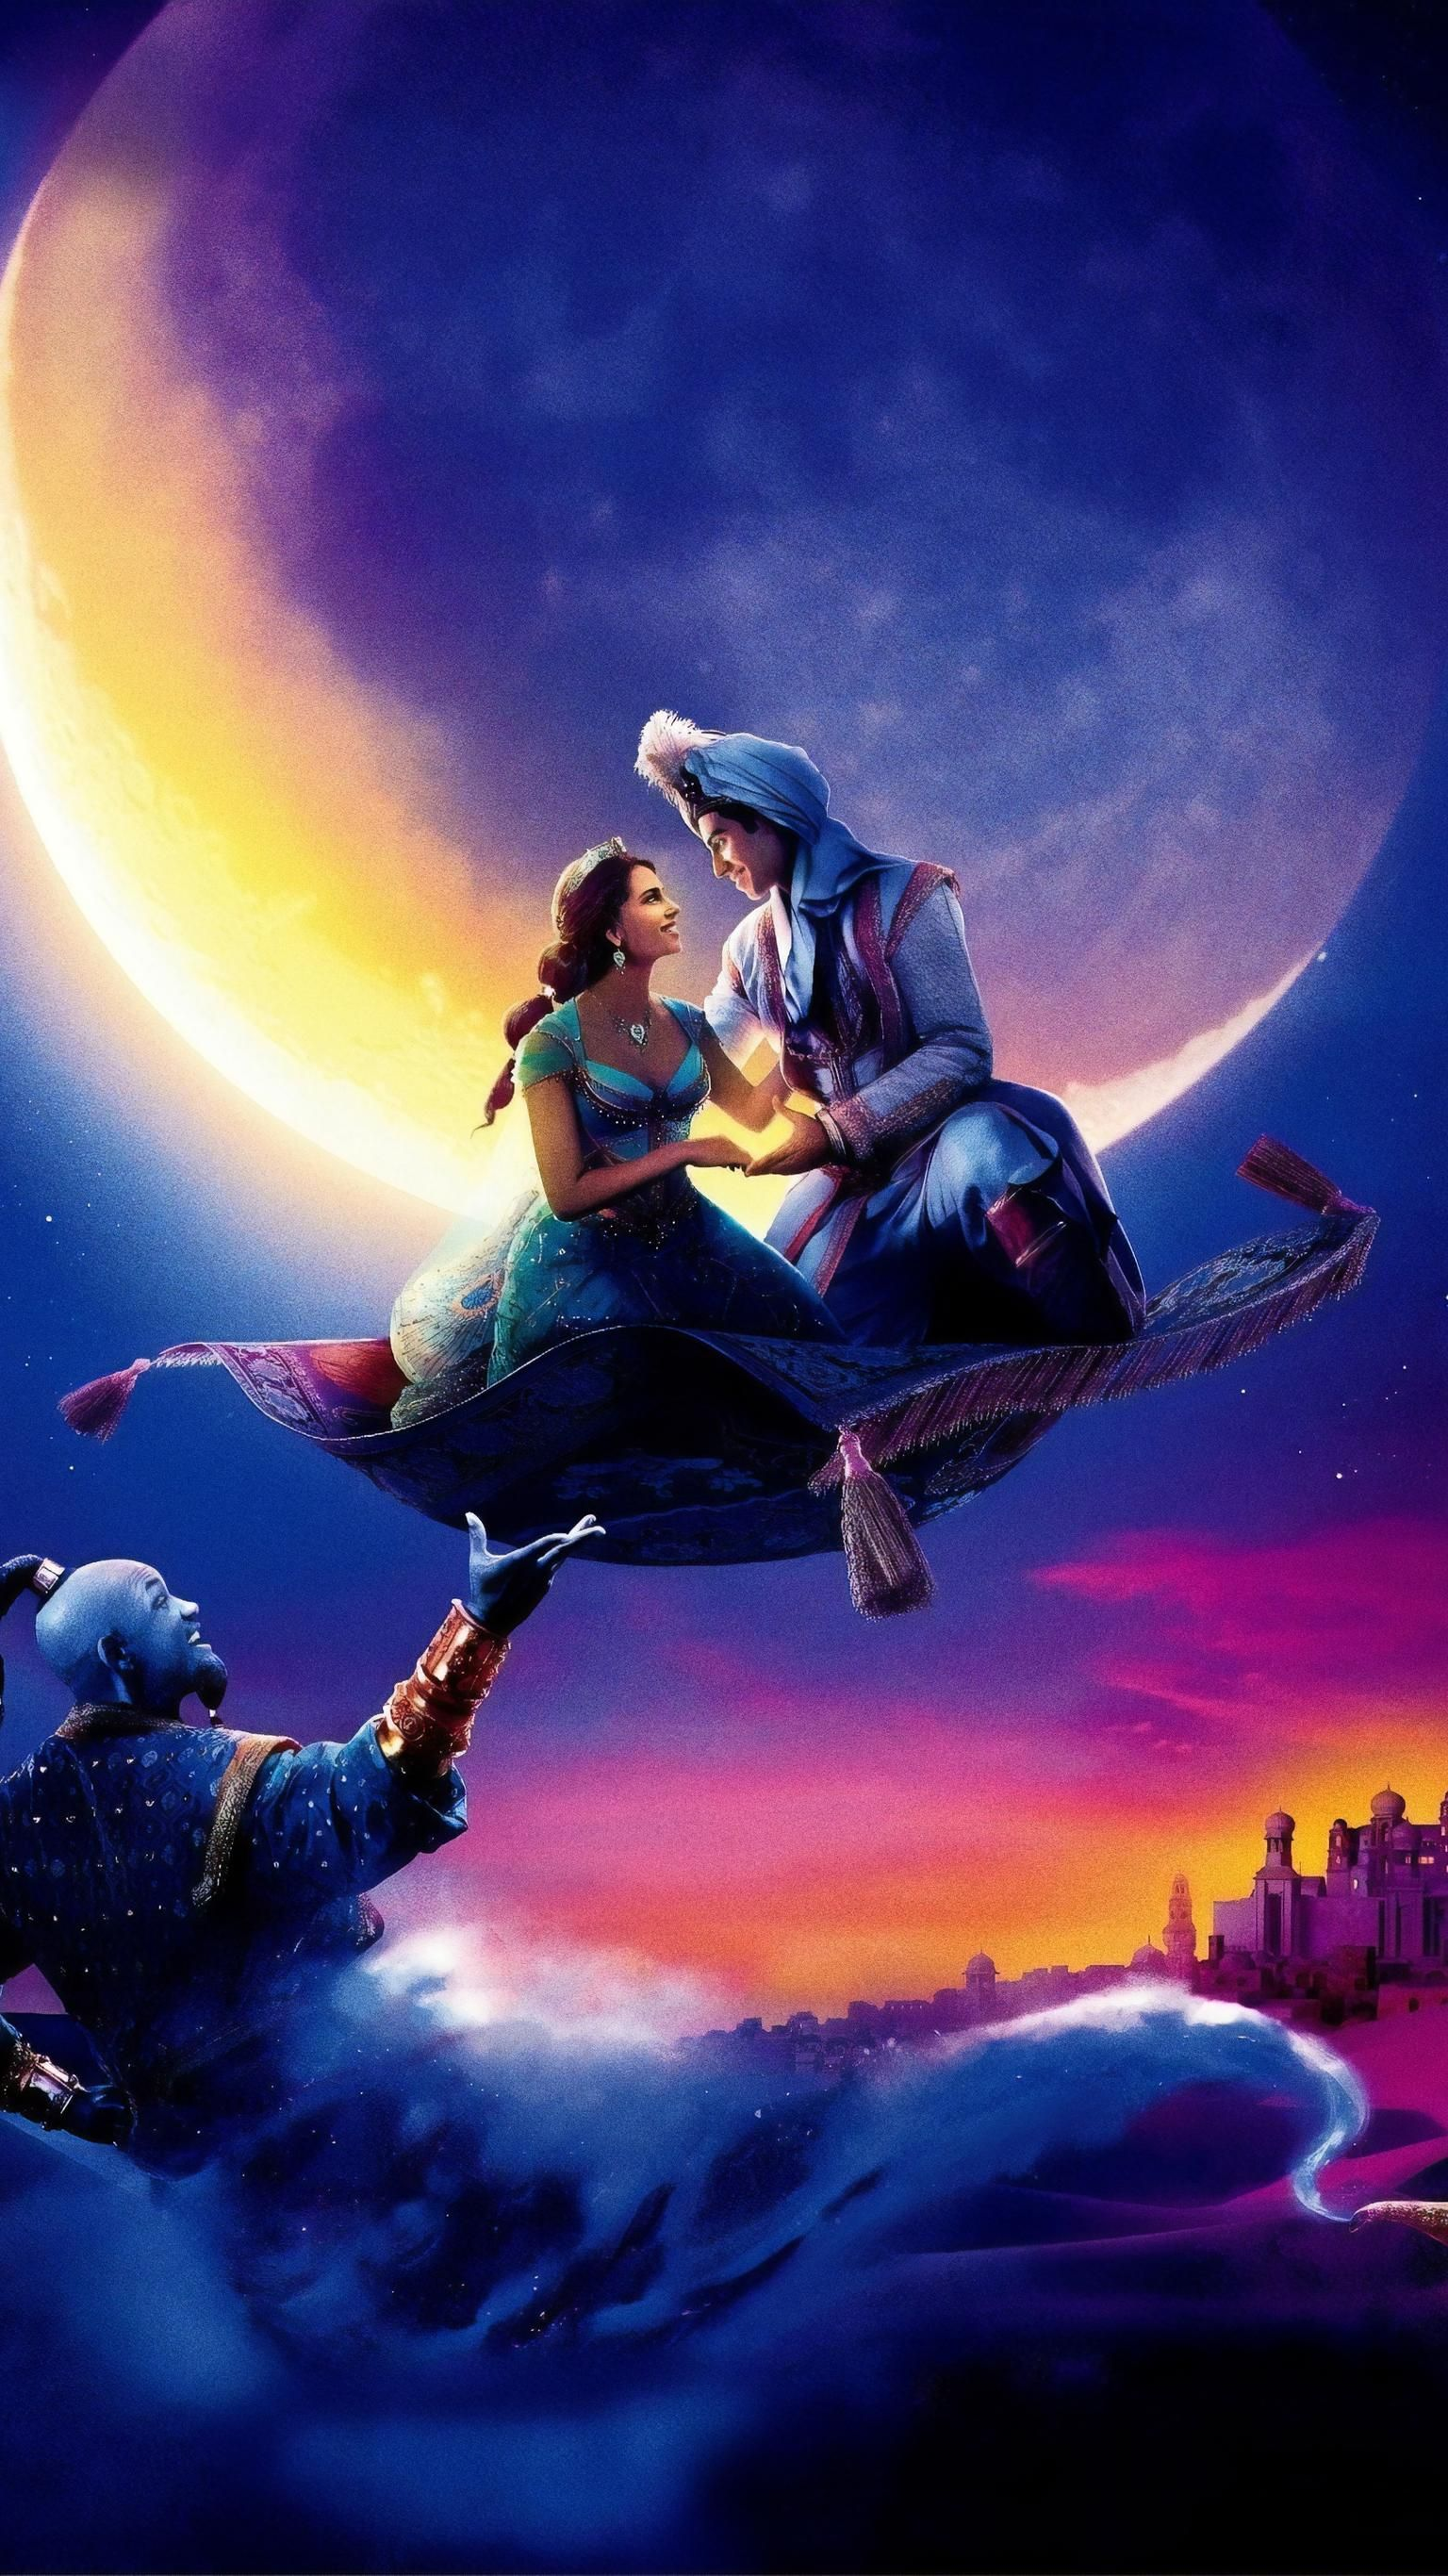 Cute Love Cartoon Wallpaper Hd Aladdin 2019 Phone Wallpaper Aladdin Wallpaper Disney